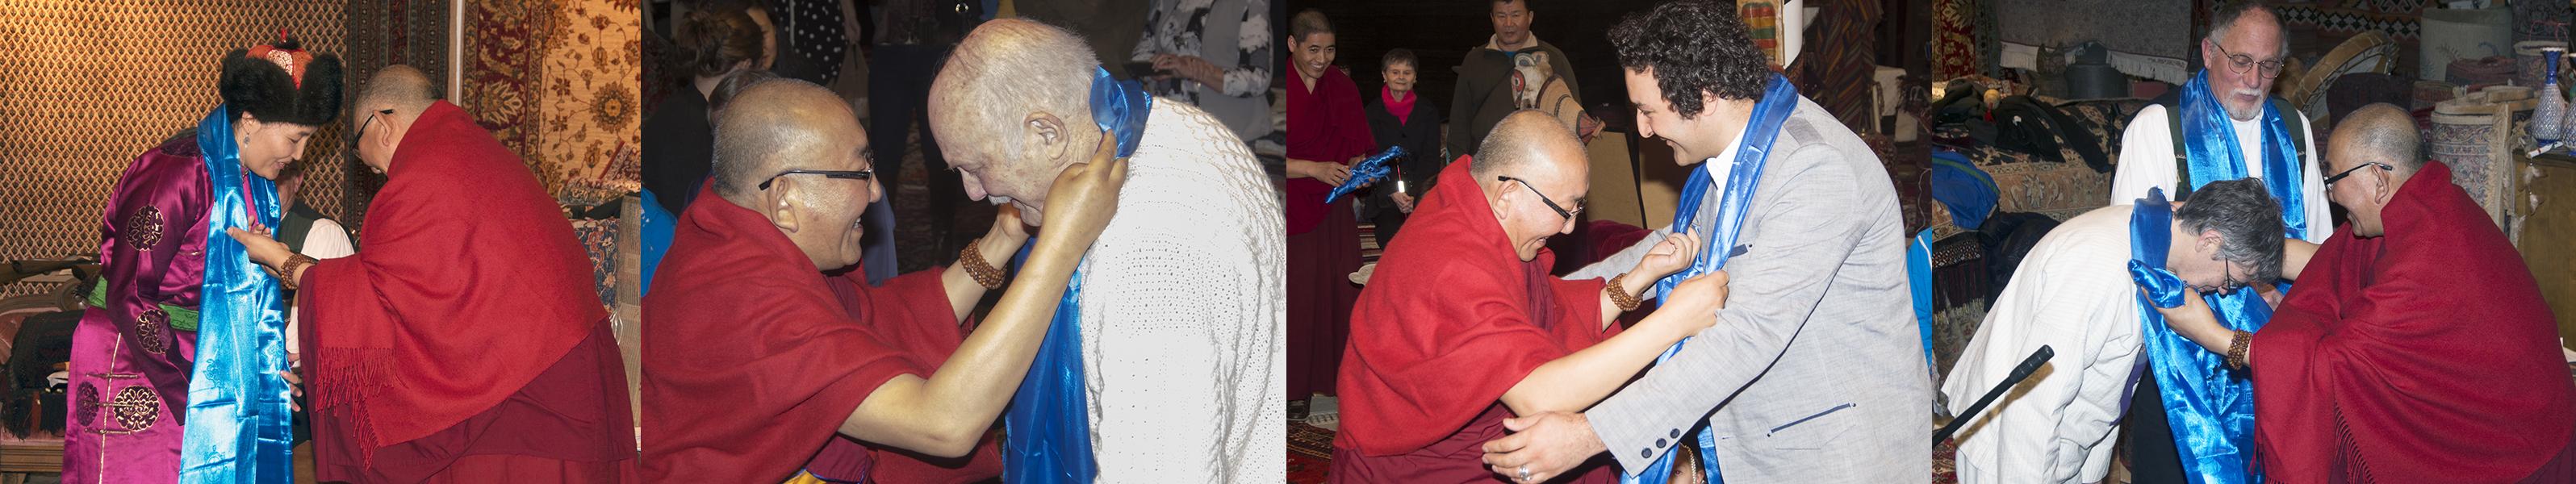 Arjaa Rinpoche Khadag  Presentations